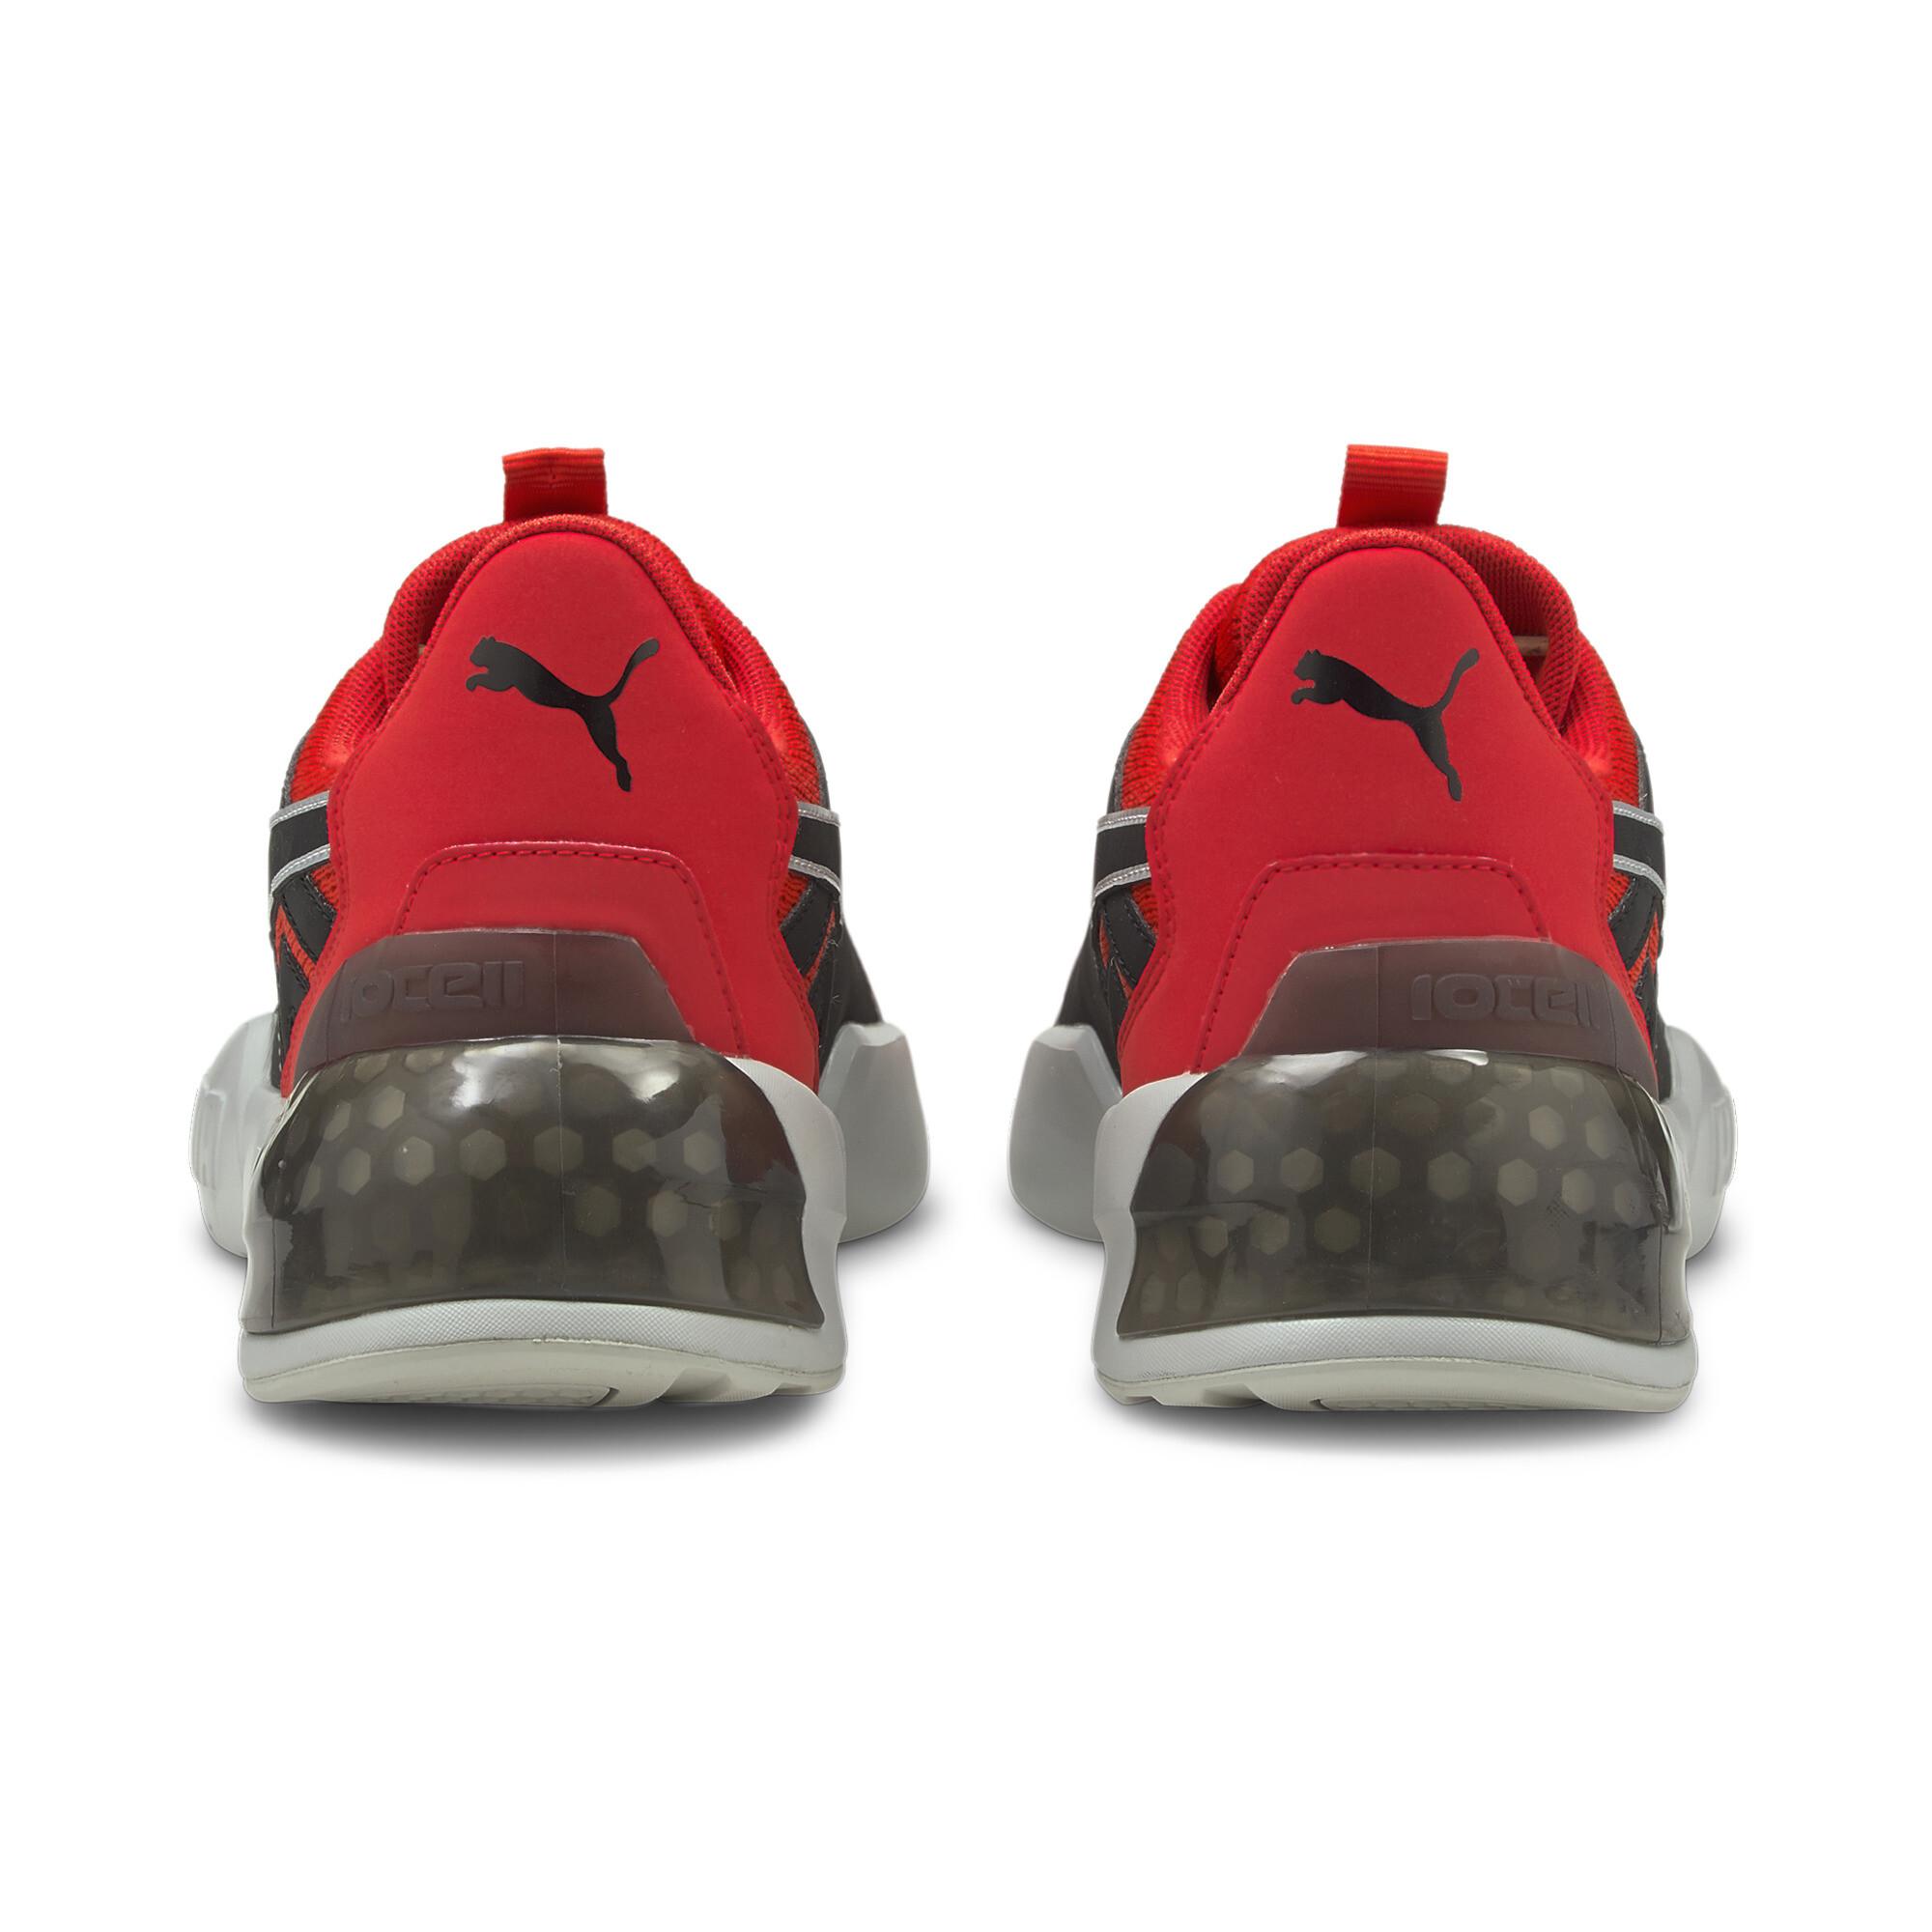 thumbnail 18 - PUMA Men's CELL Pharos Training Shoes